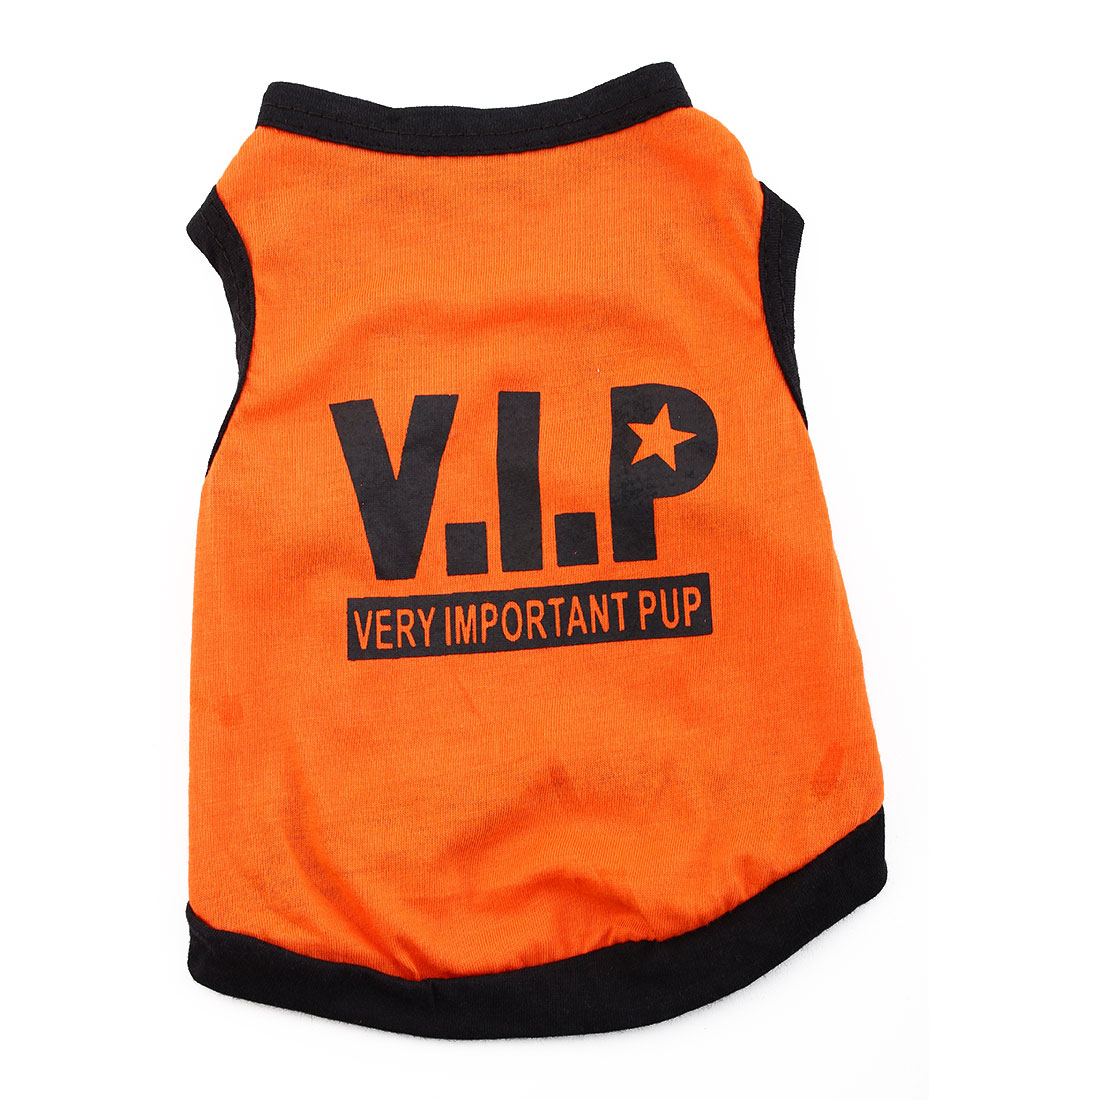 VIP Print Summer Coat Puppy Costume Pet Clothing Small Dog Cat Vest T-shirt Tee Orange Size S